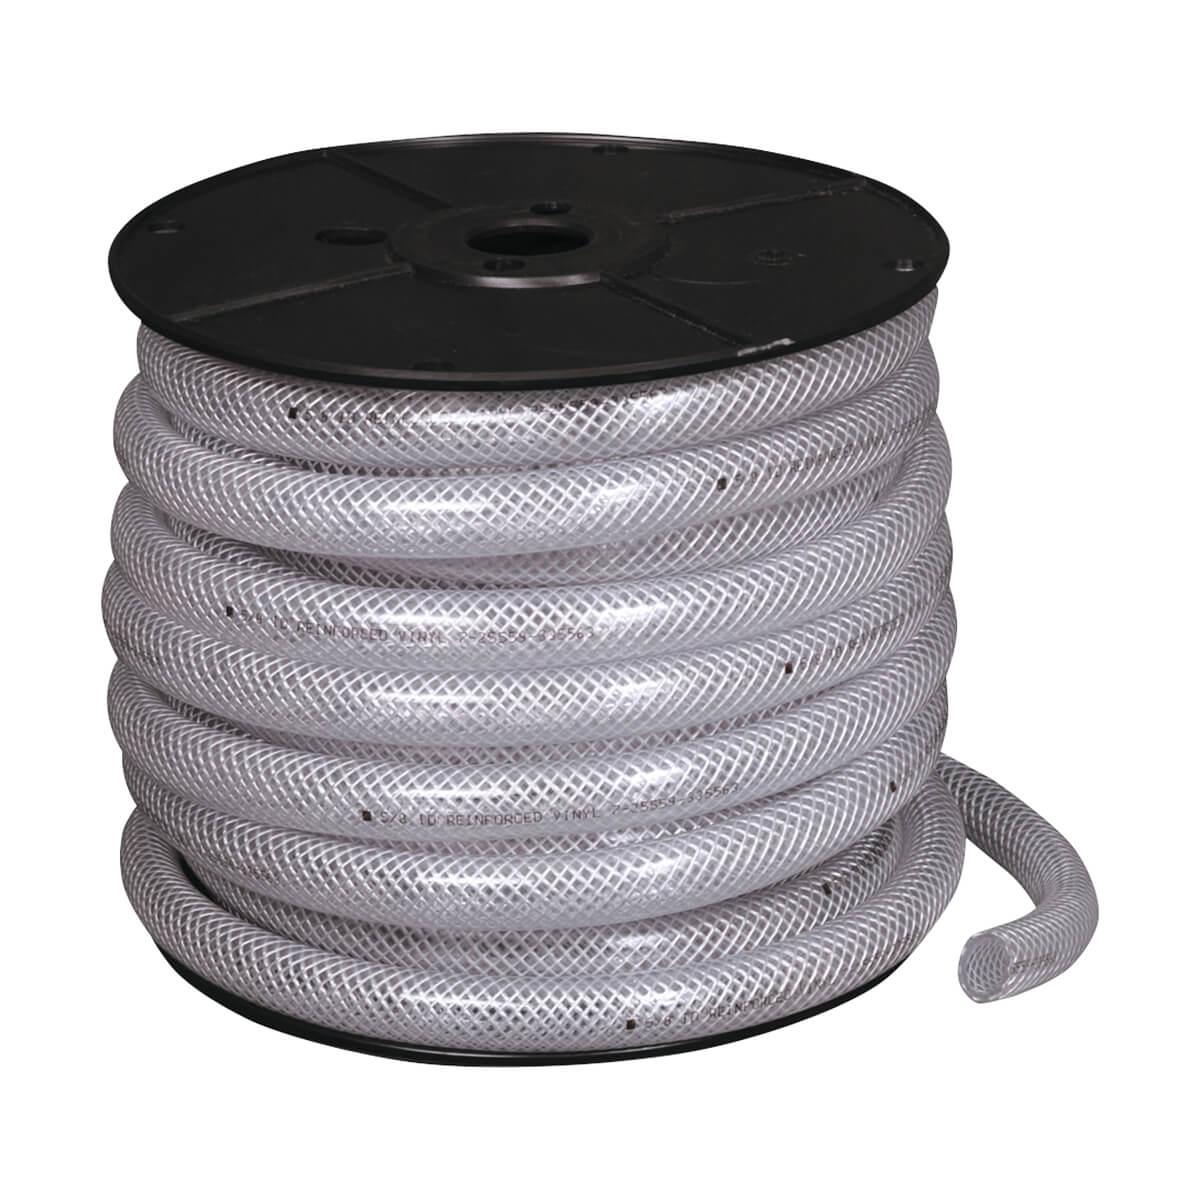 Reinforced Clear Vinyl Tubing — Bulk - 1-1/4-in - Price Per Ft